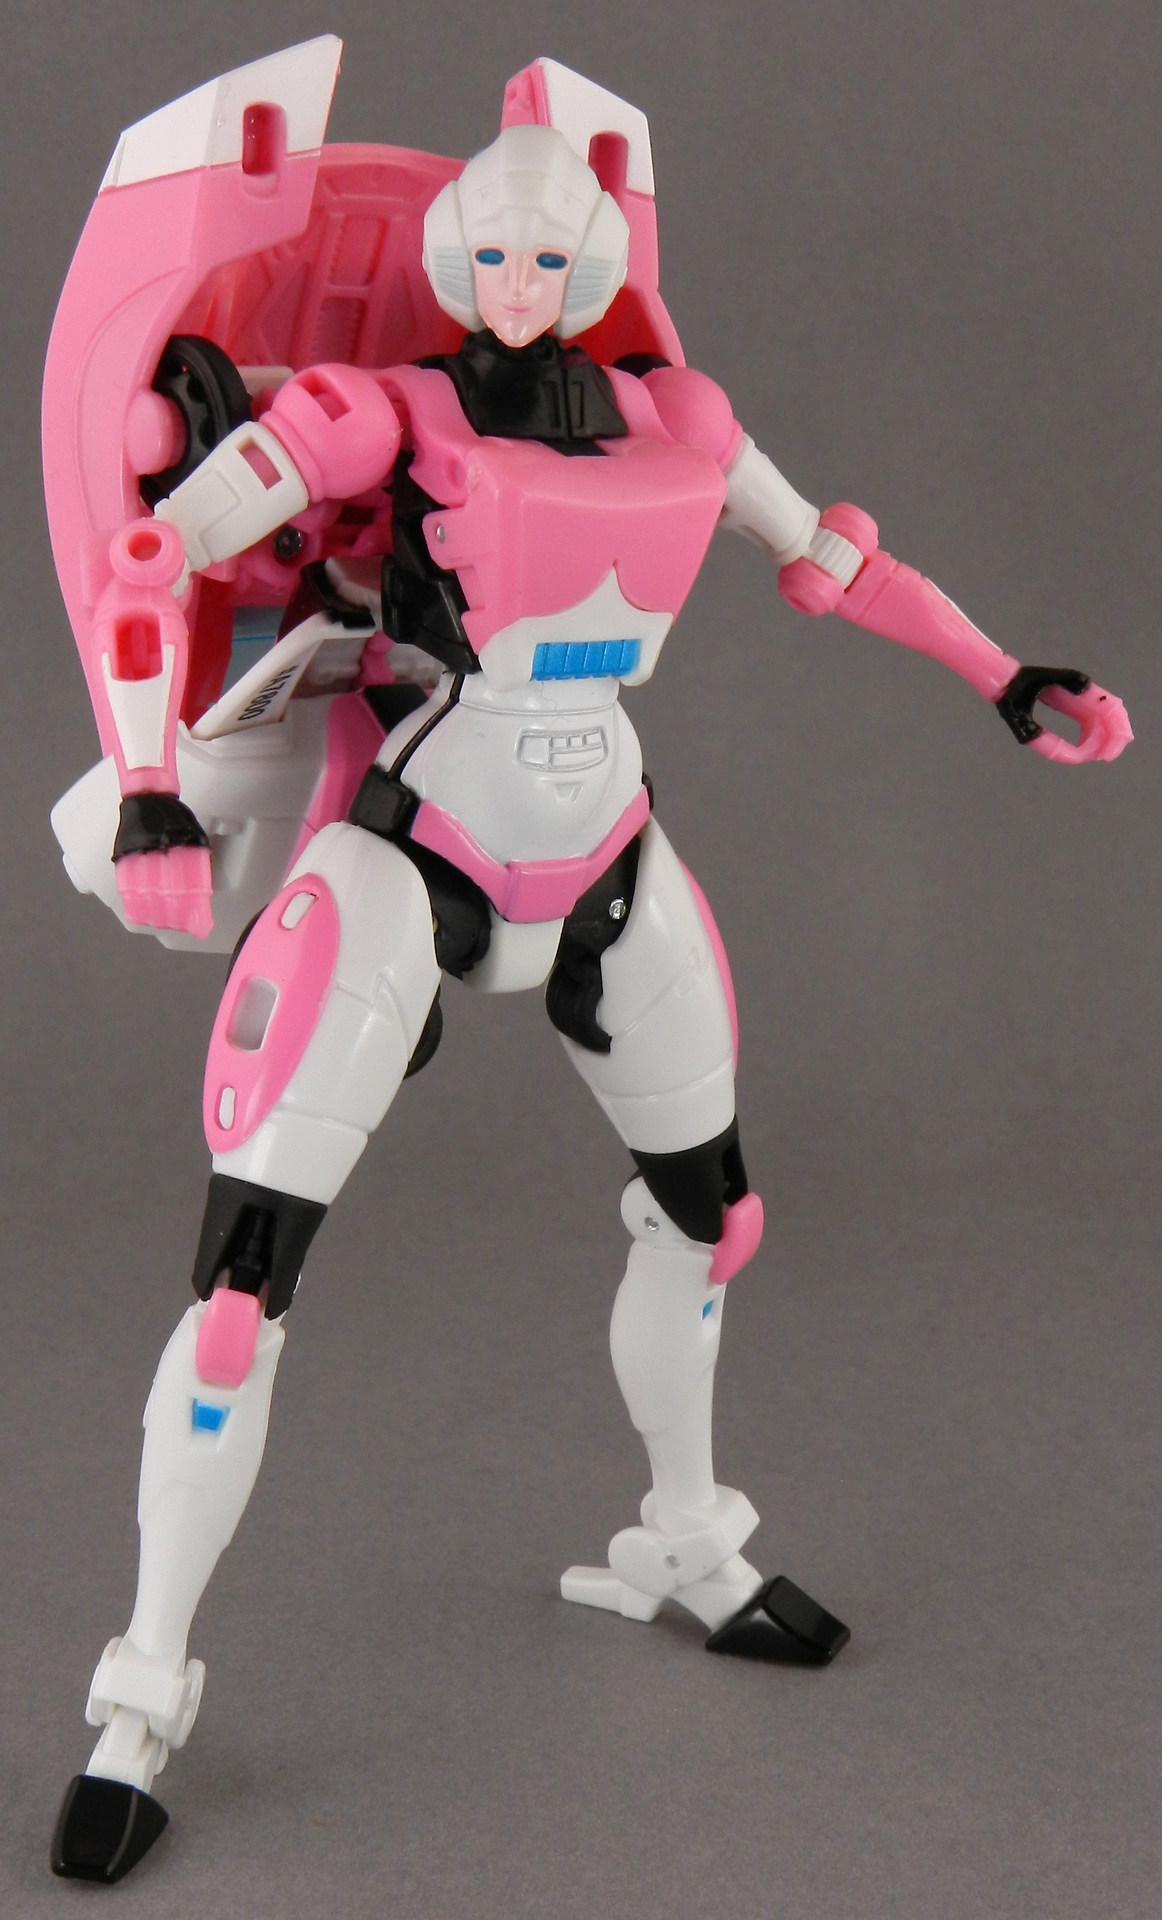 Arcee-Robot-009